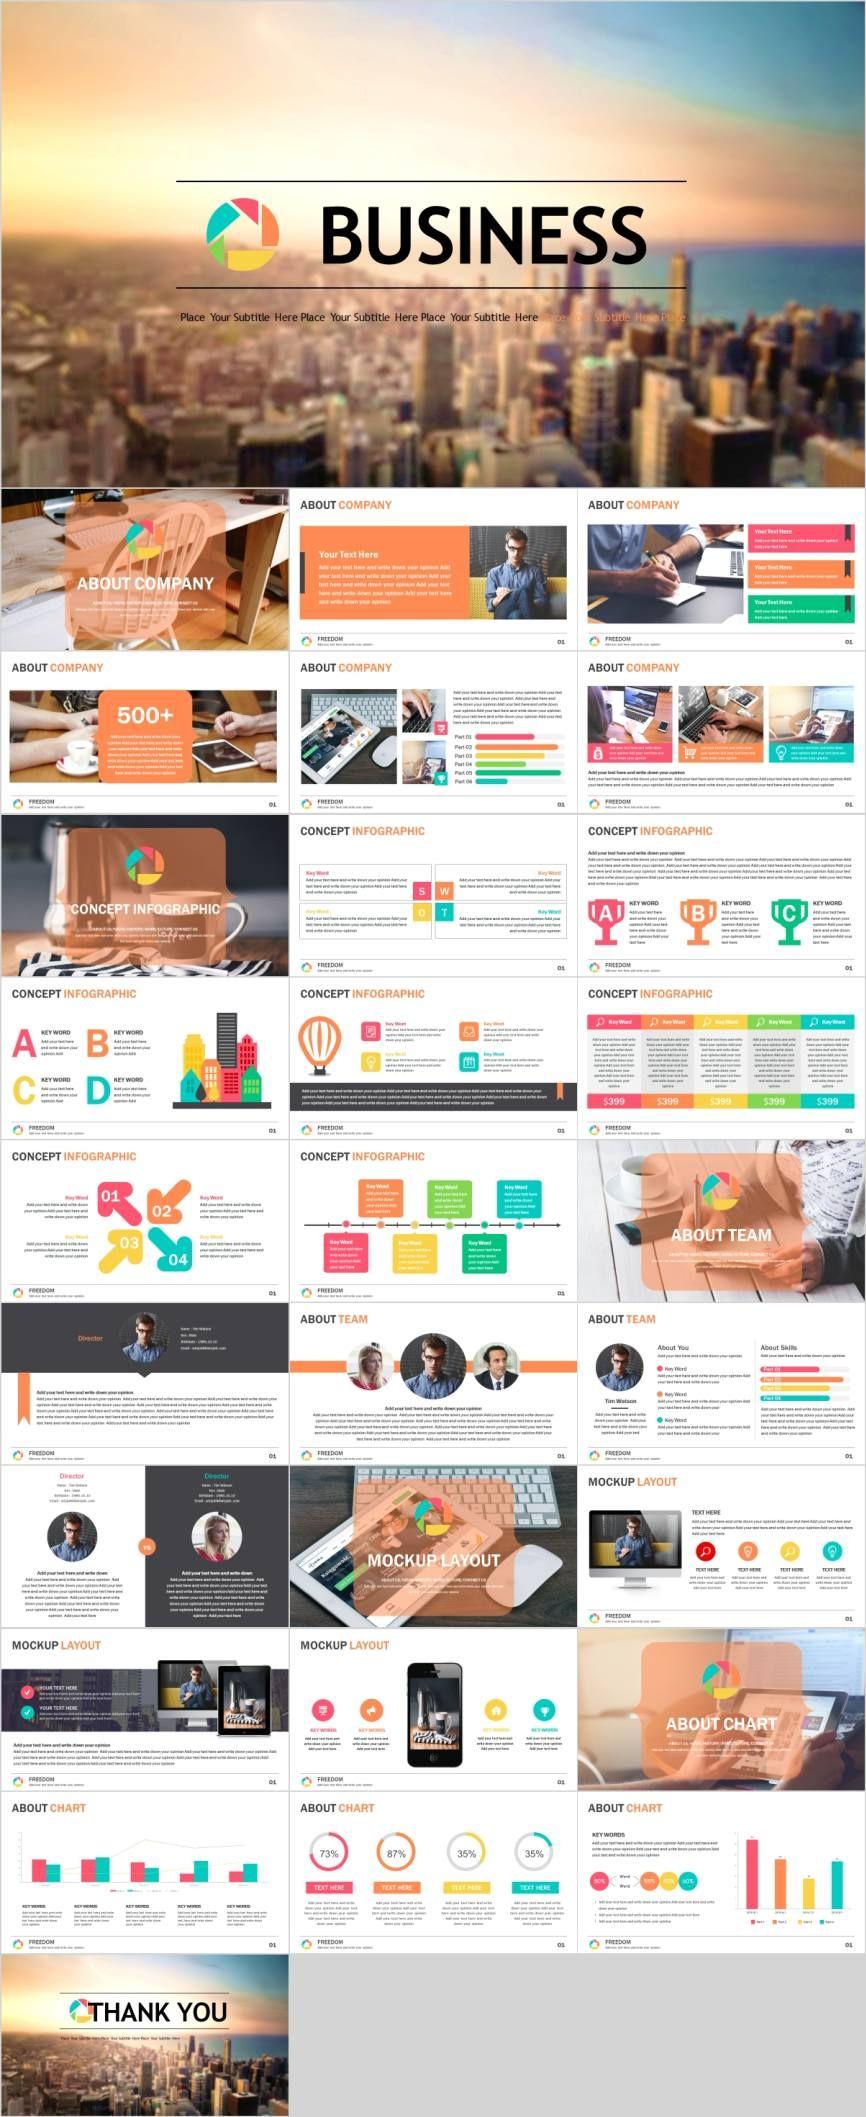 Project analysisPowerPoint template